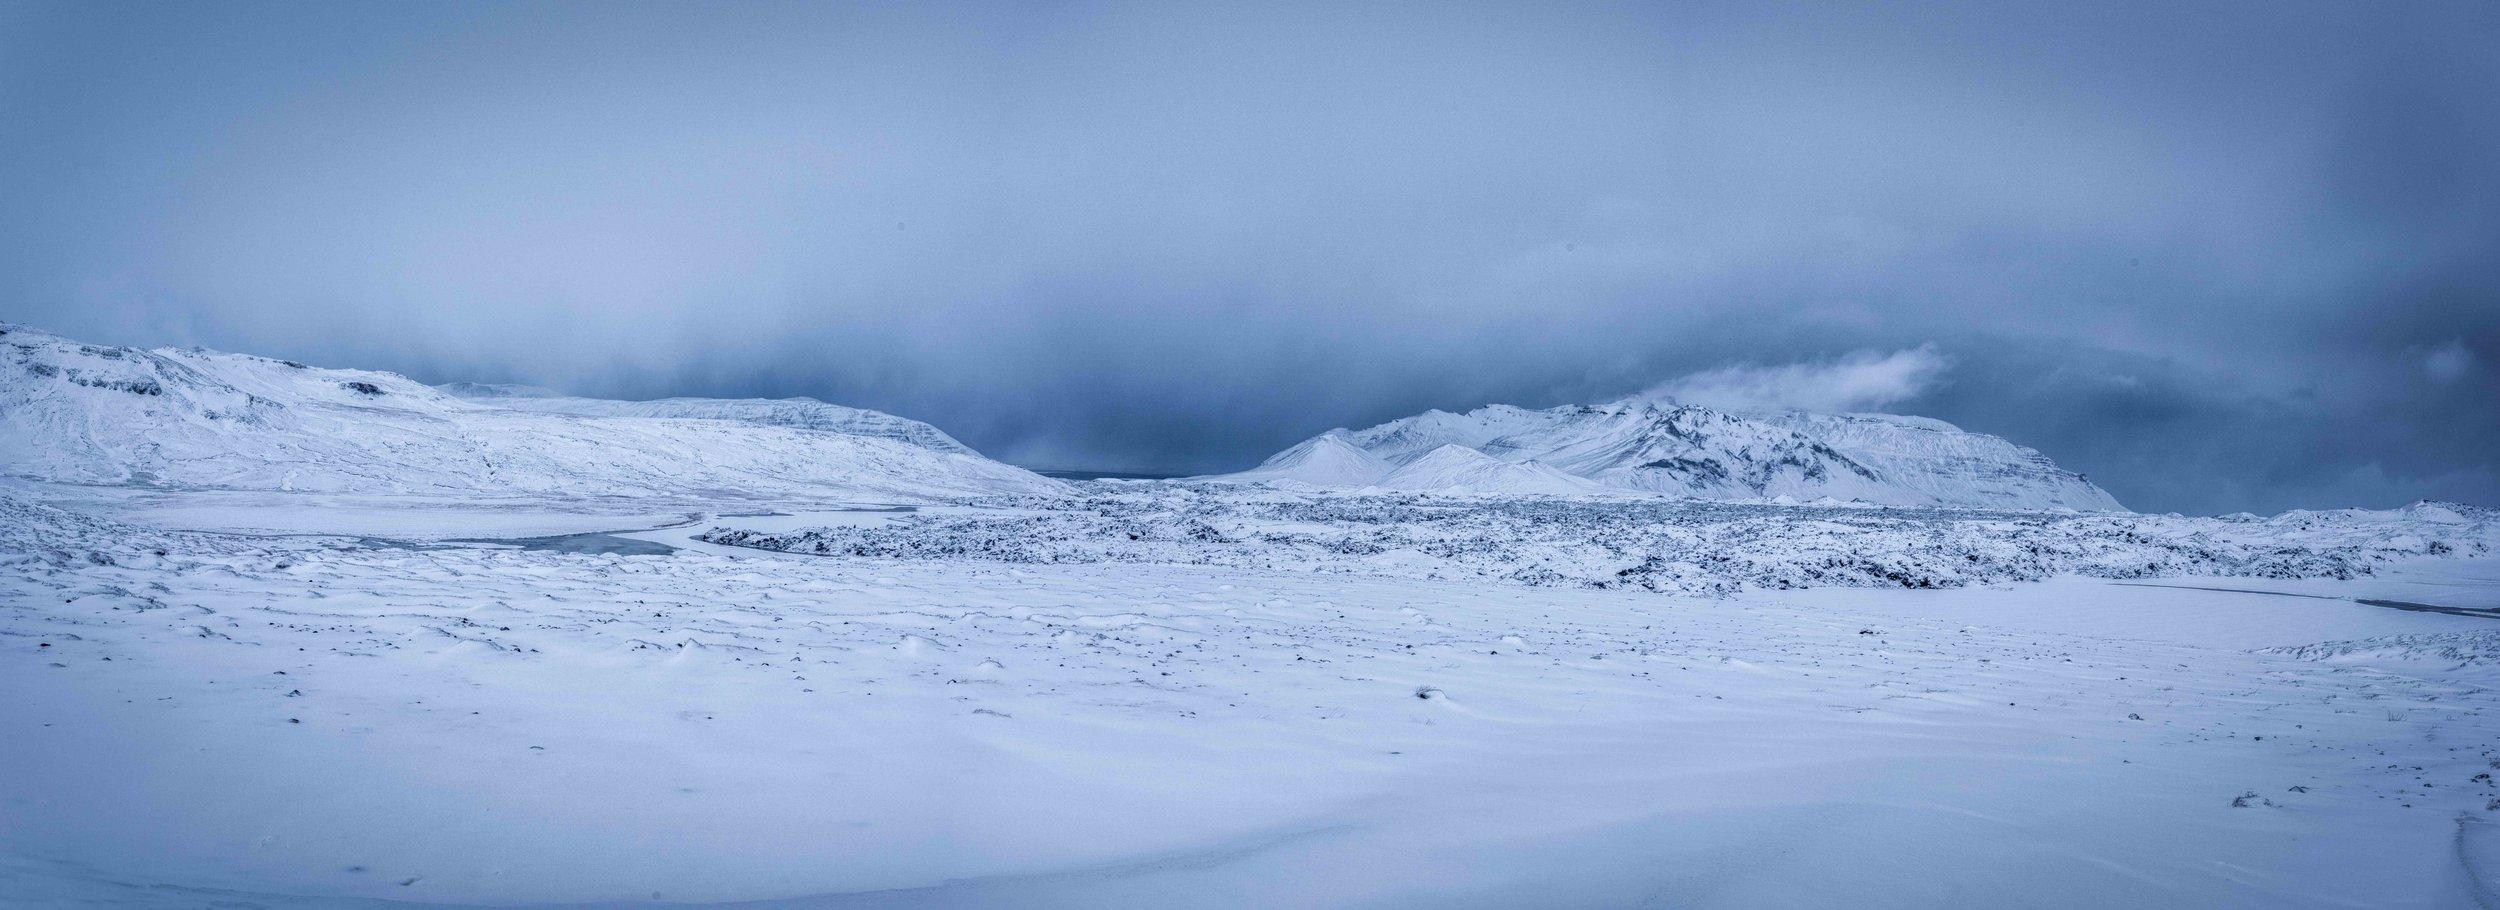 Iceland 2018 - Monday day 2--3.jpg